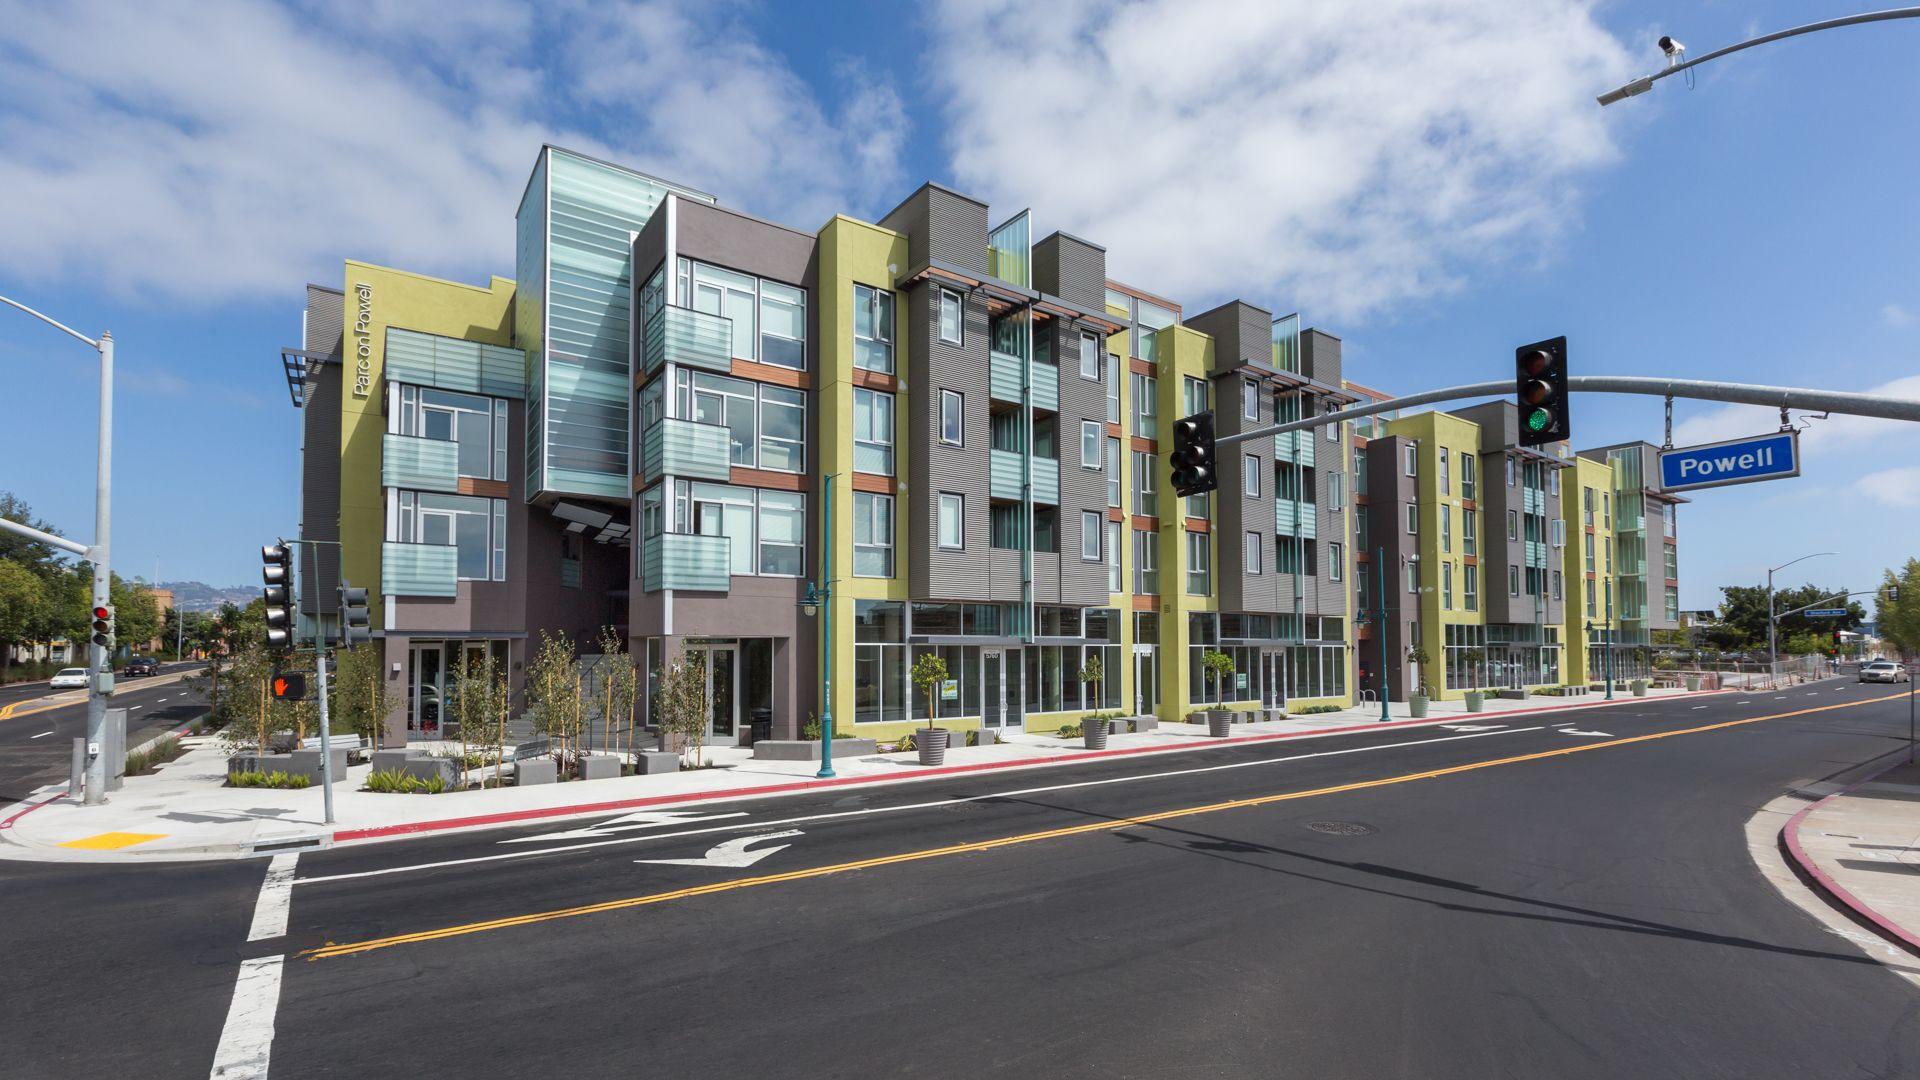 Parc on Powell Apartments - Building